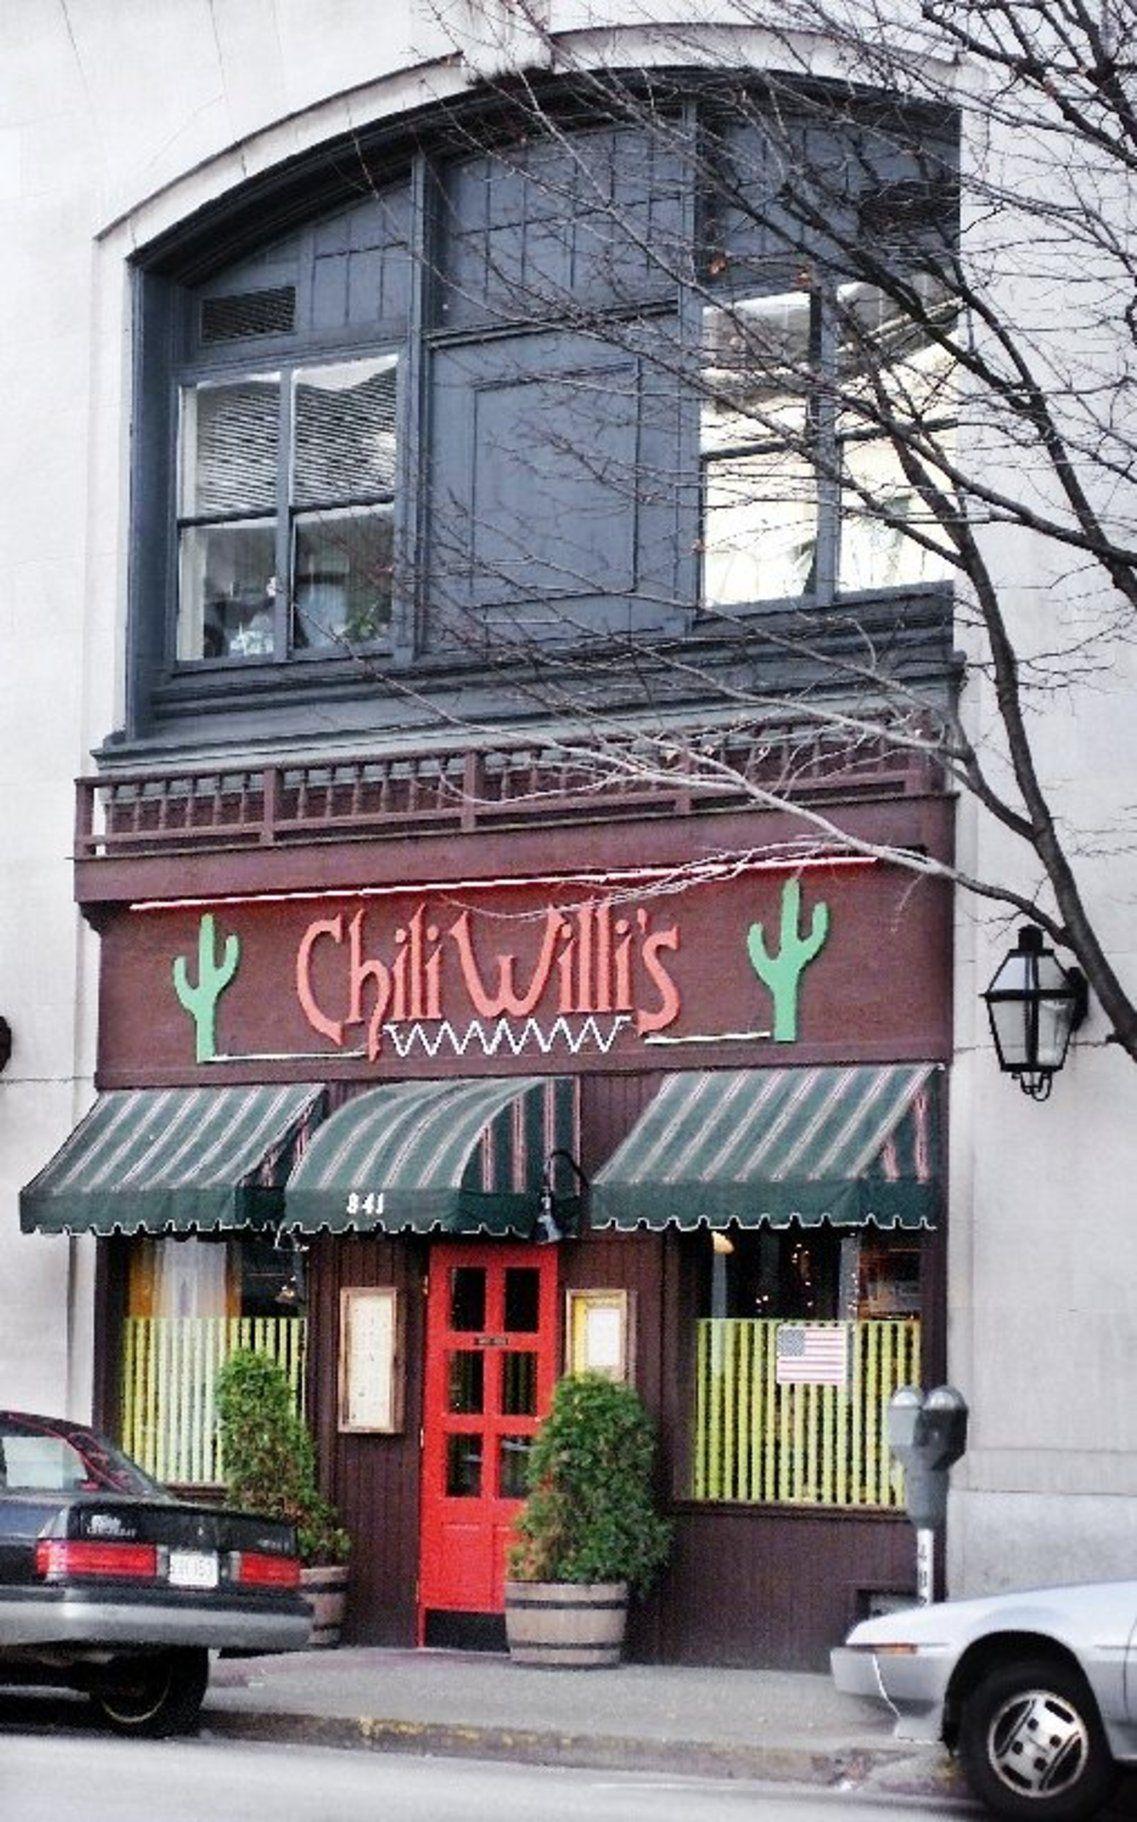 Exterior of Chili Willi's second location